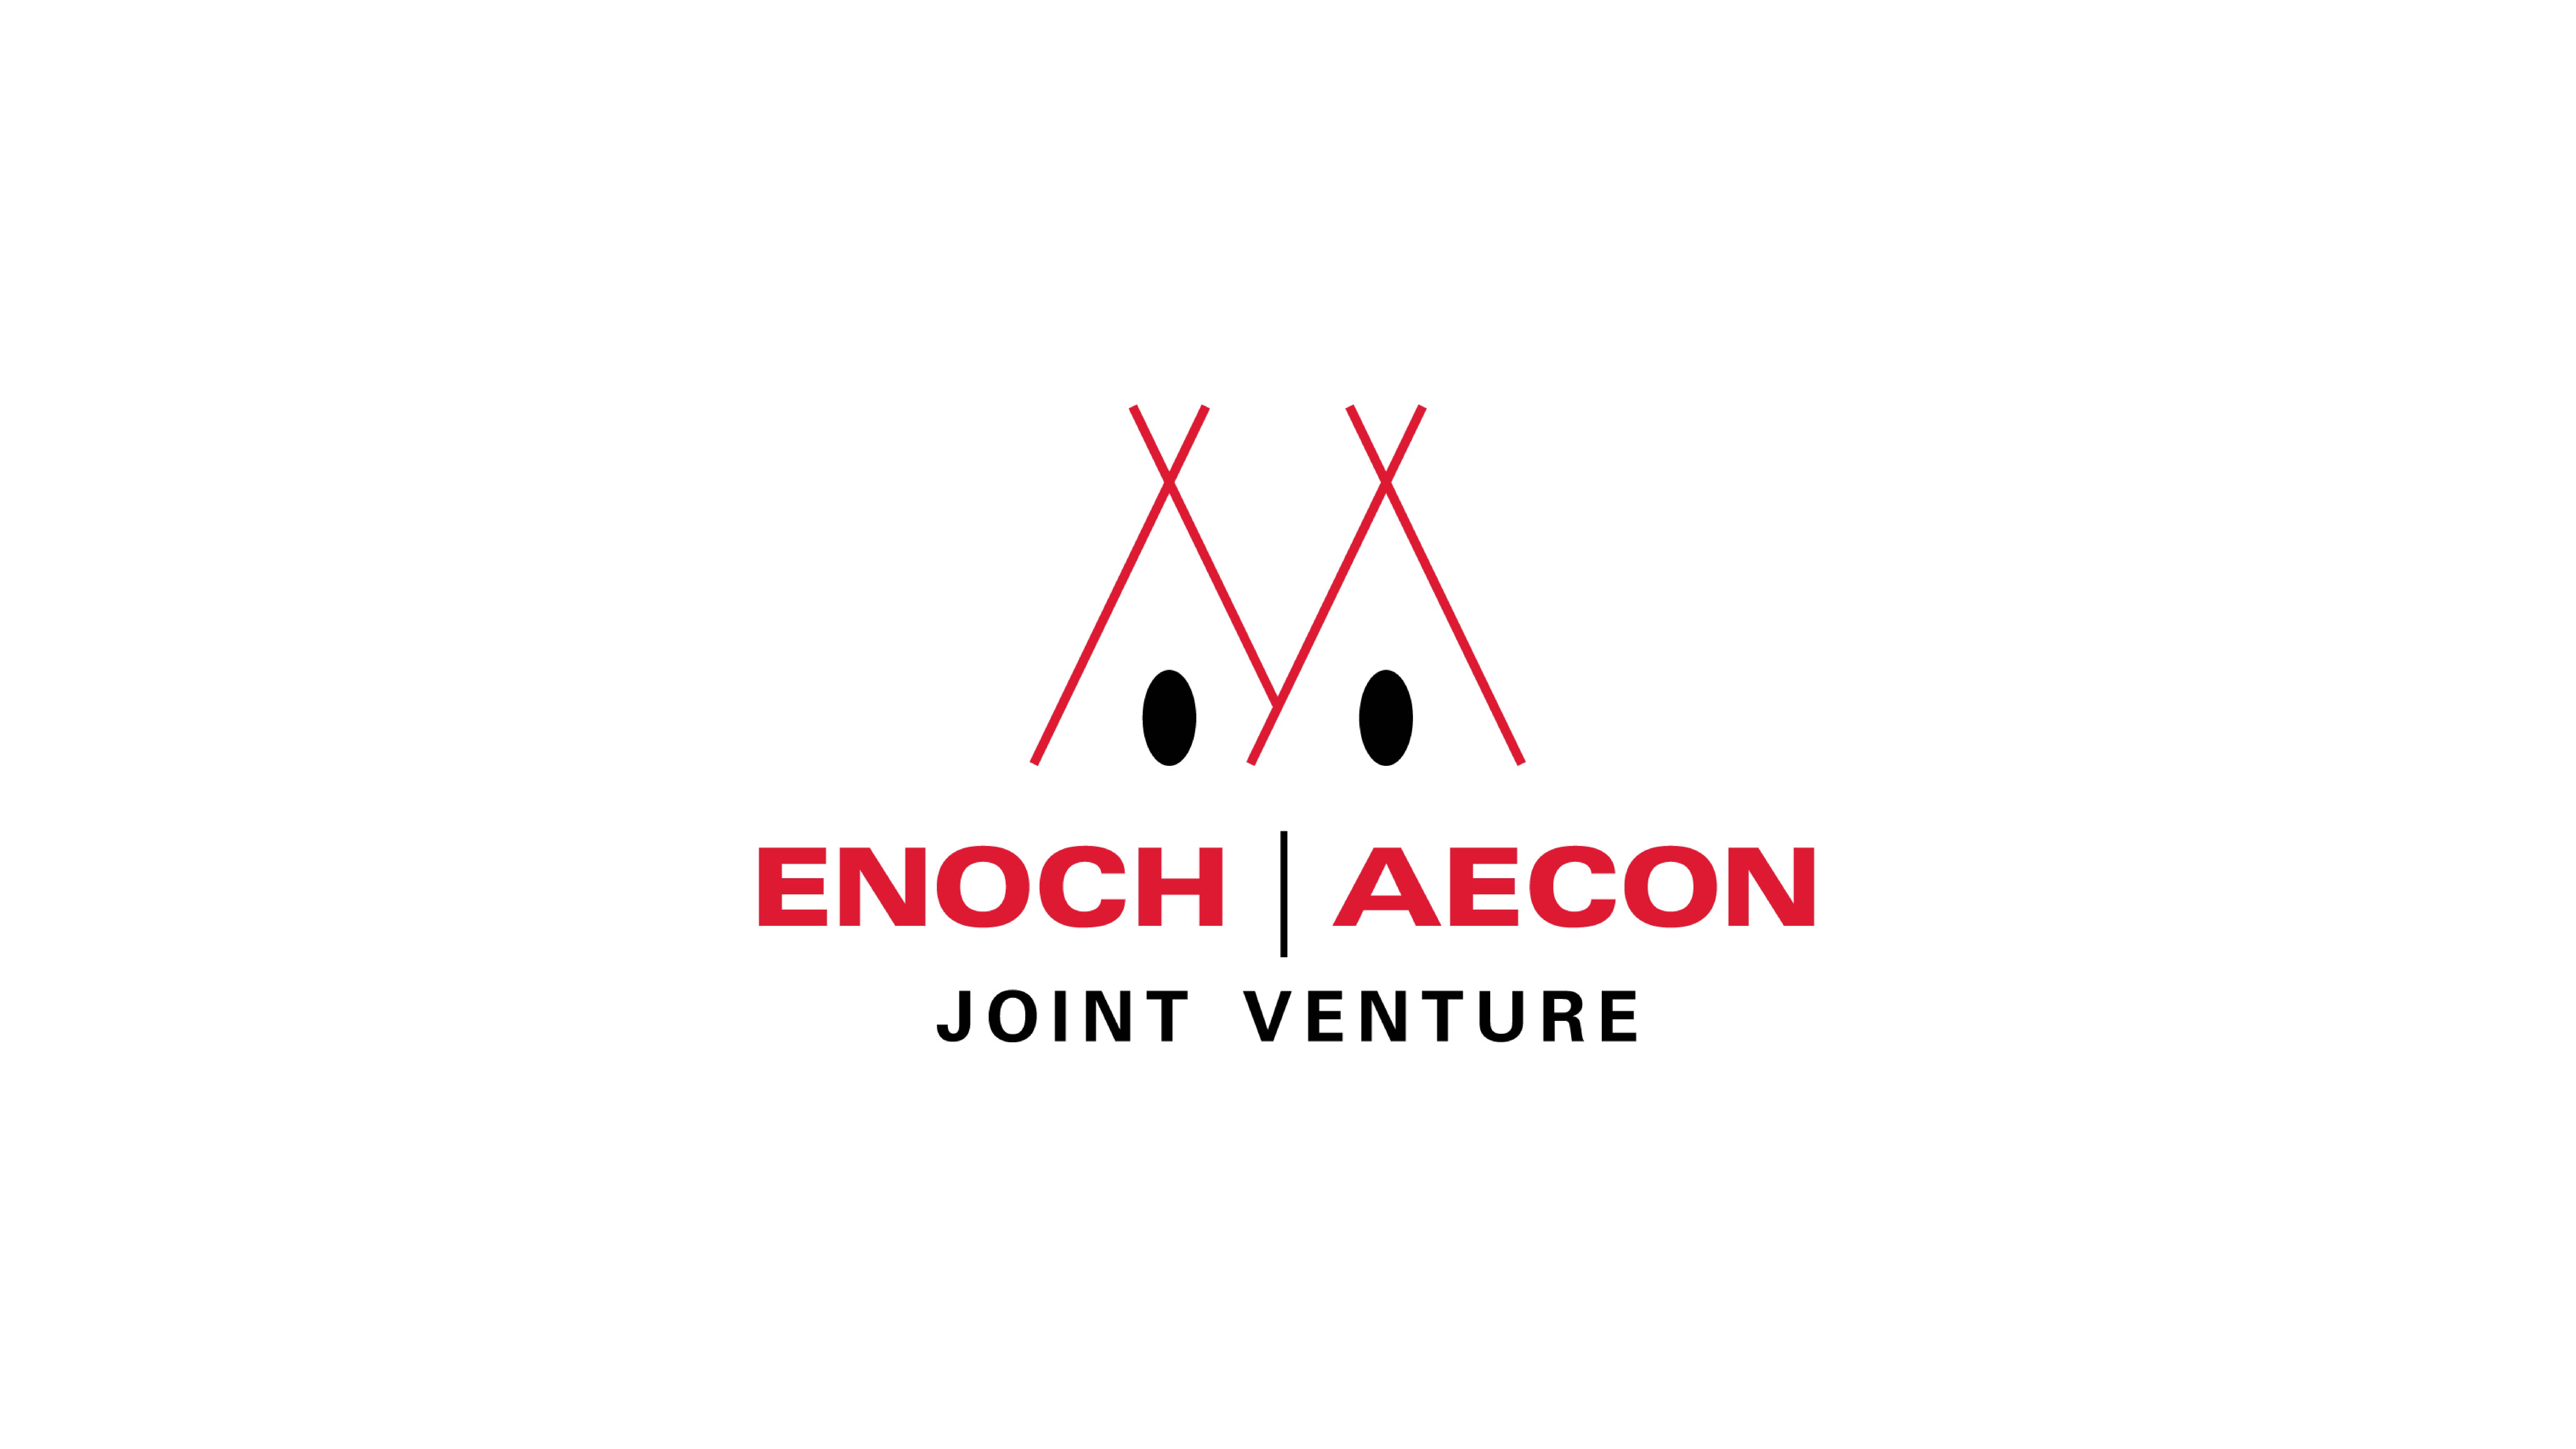 Enoch-Aecon Joint Venture